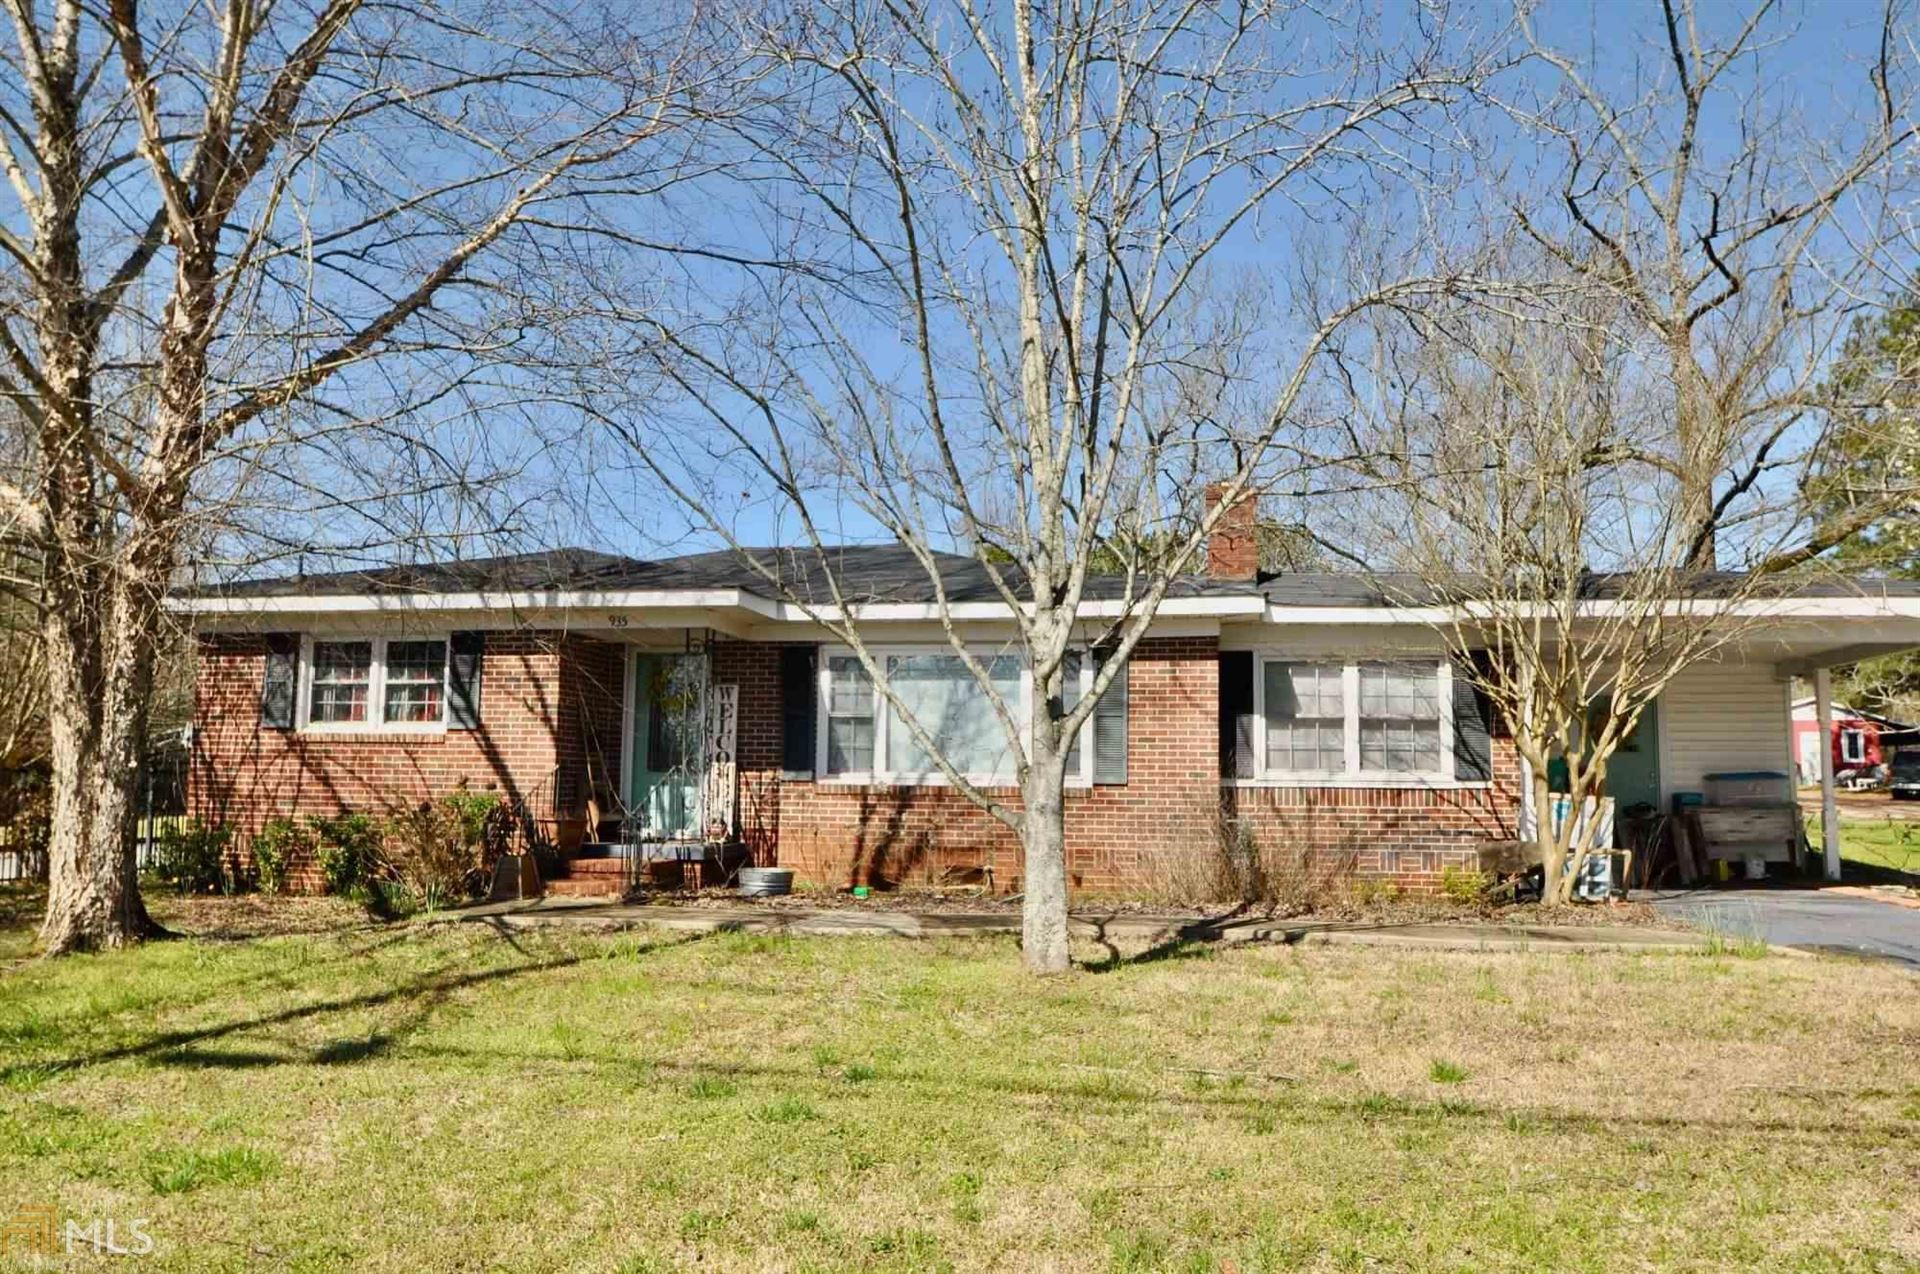 935 Danielsville Rd, Athens, GA 30606 - MLS#: 8852205